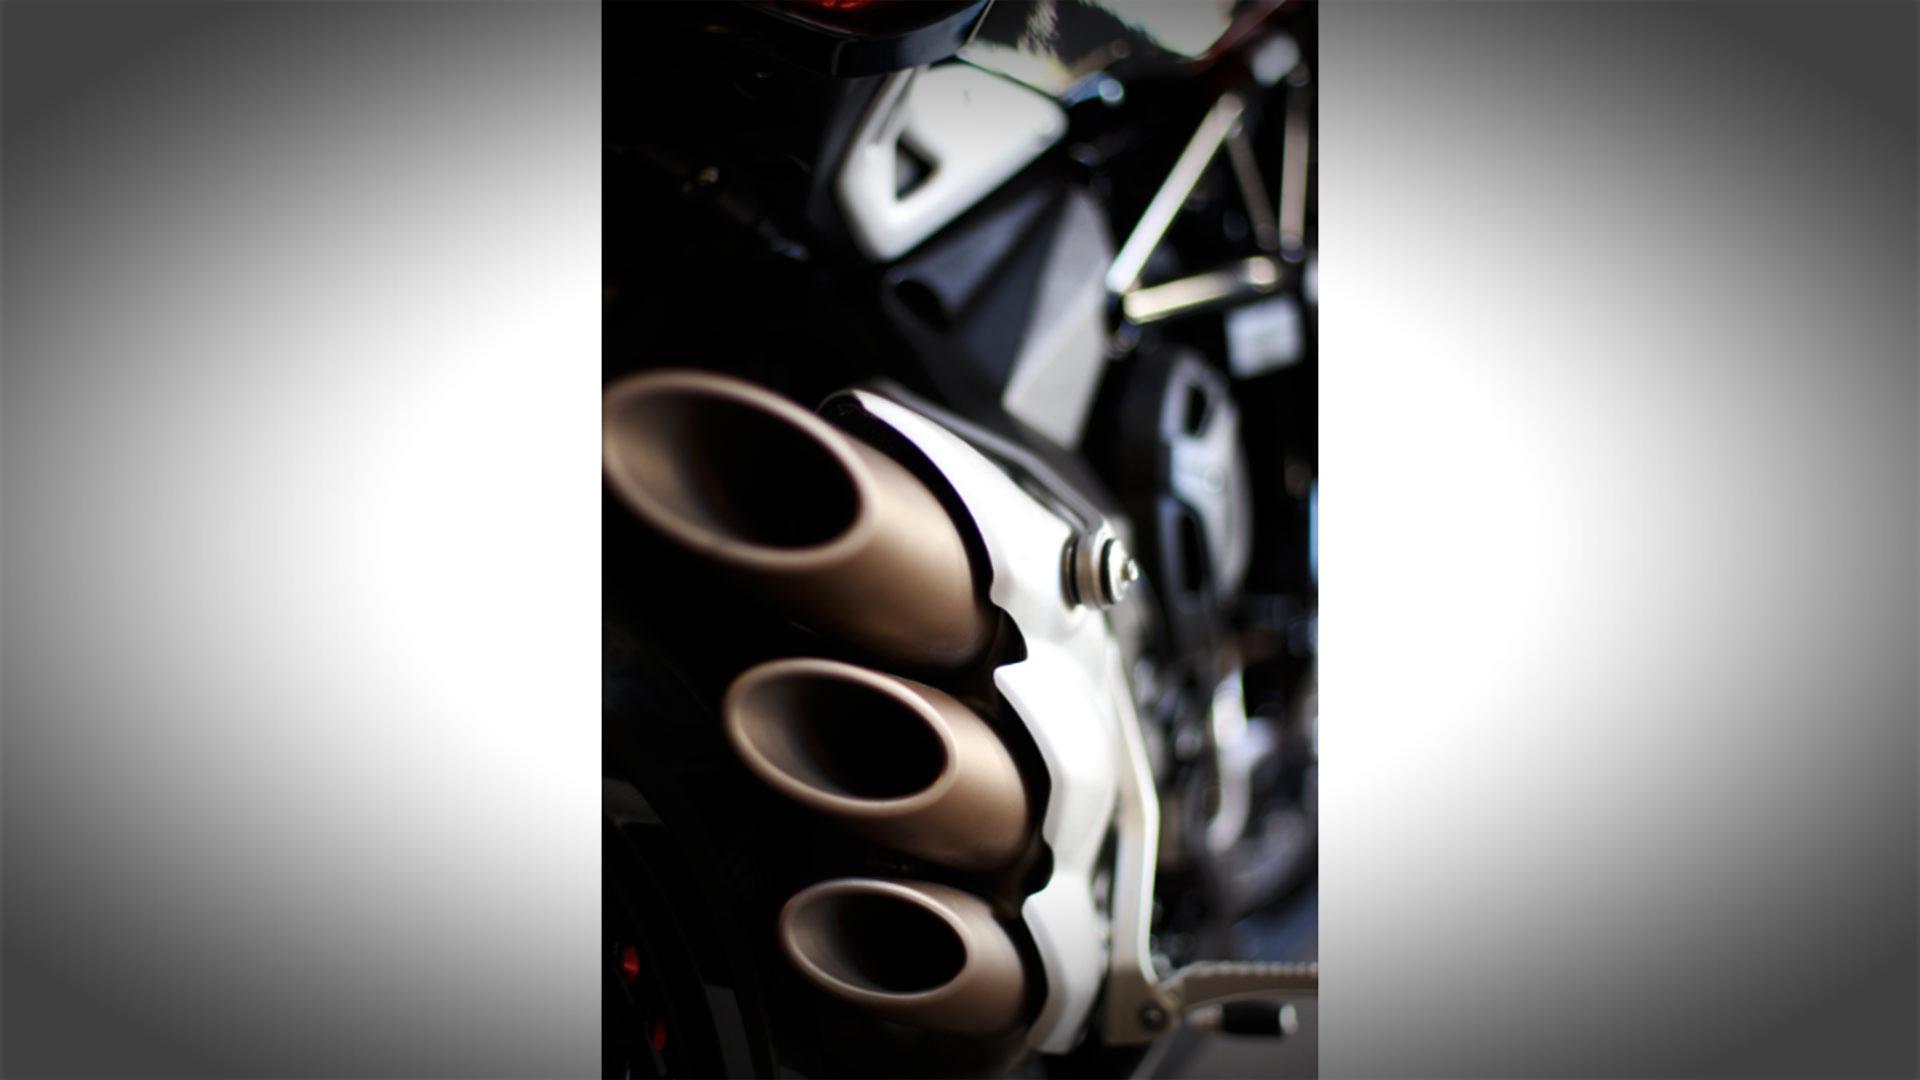 mv-agusta-dragster-800-rr-prova-test